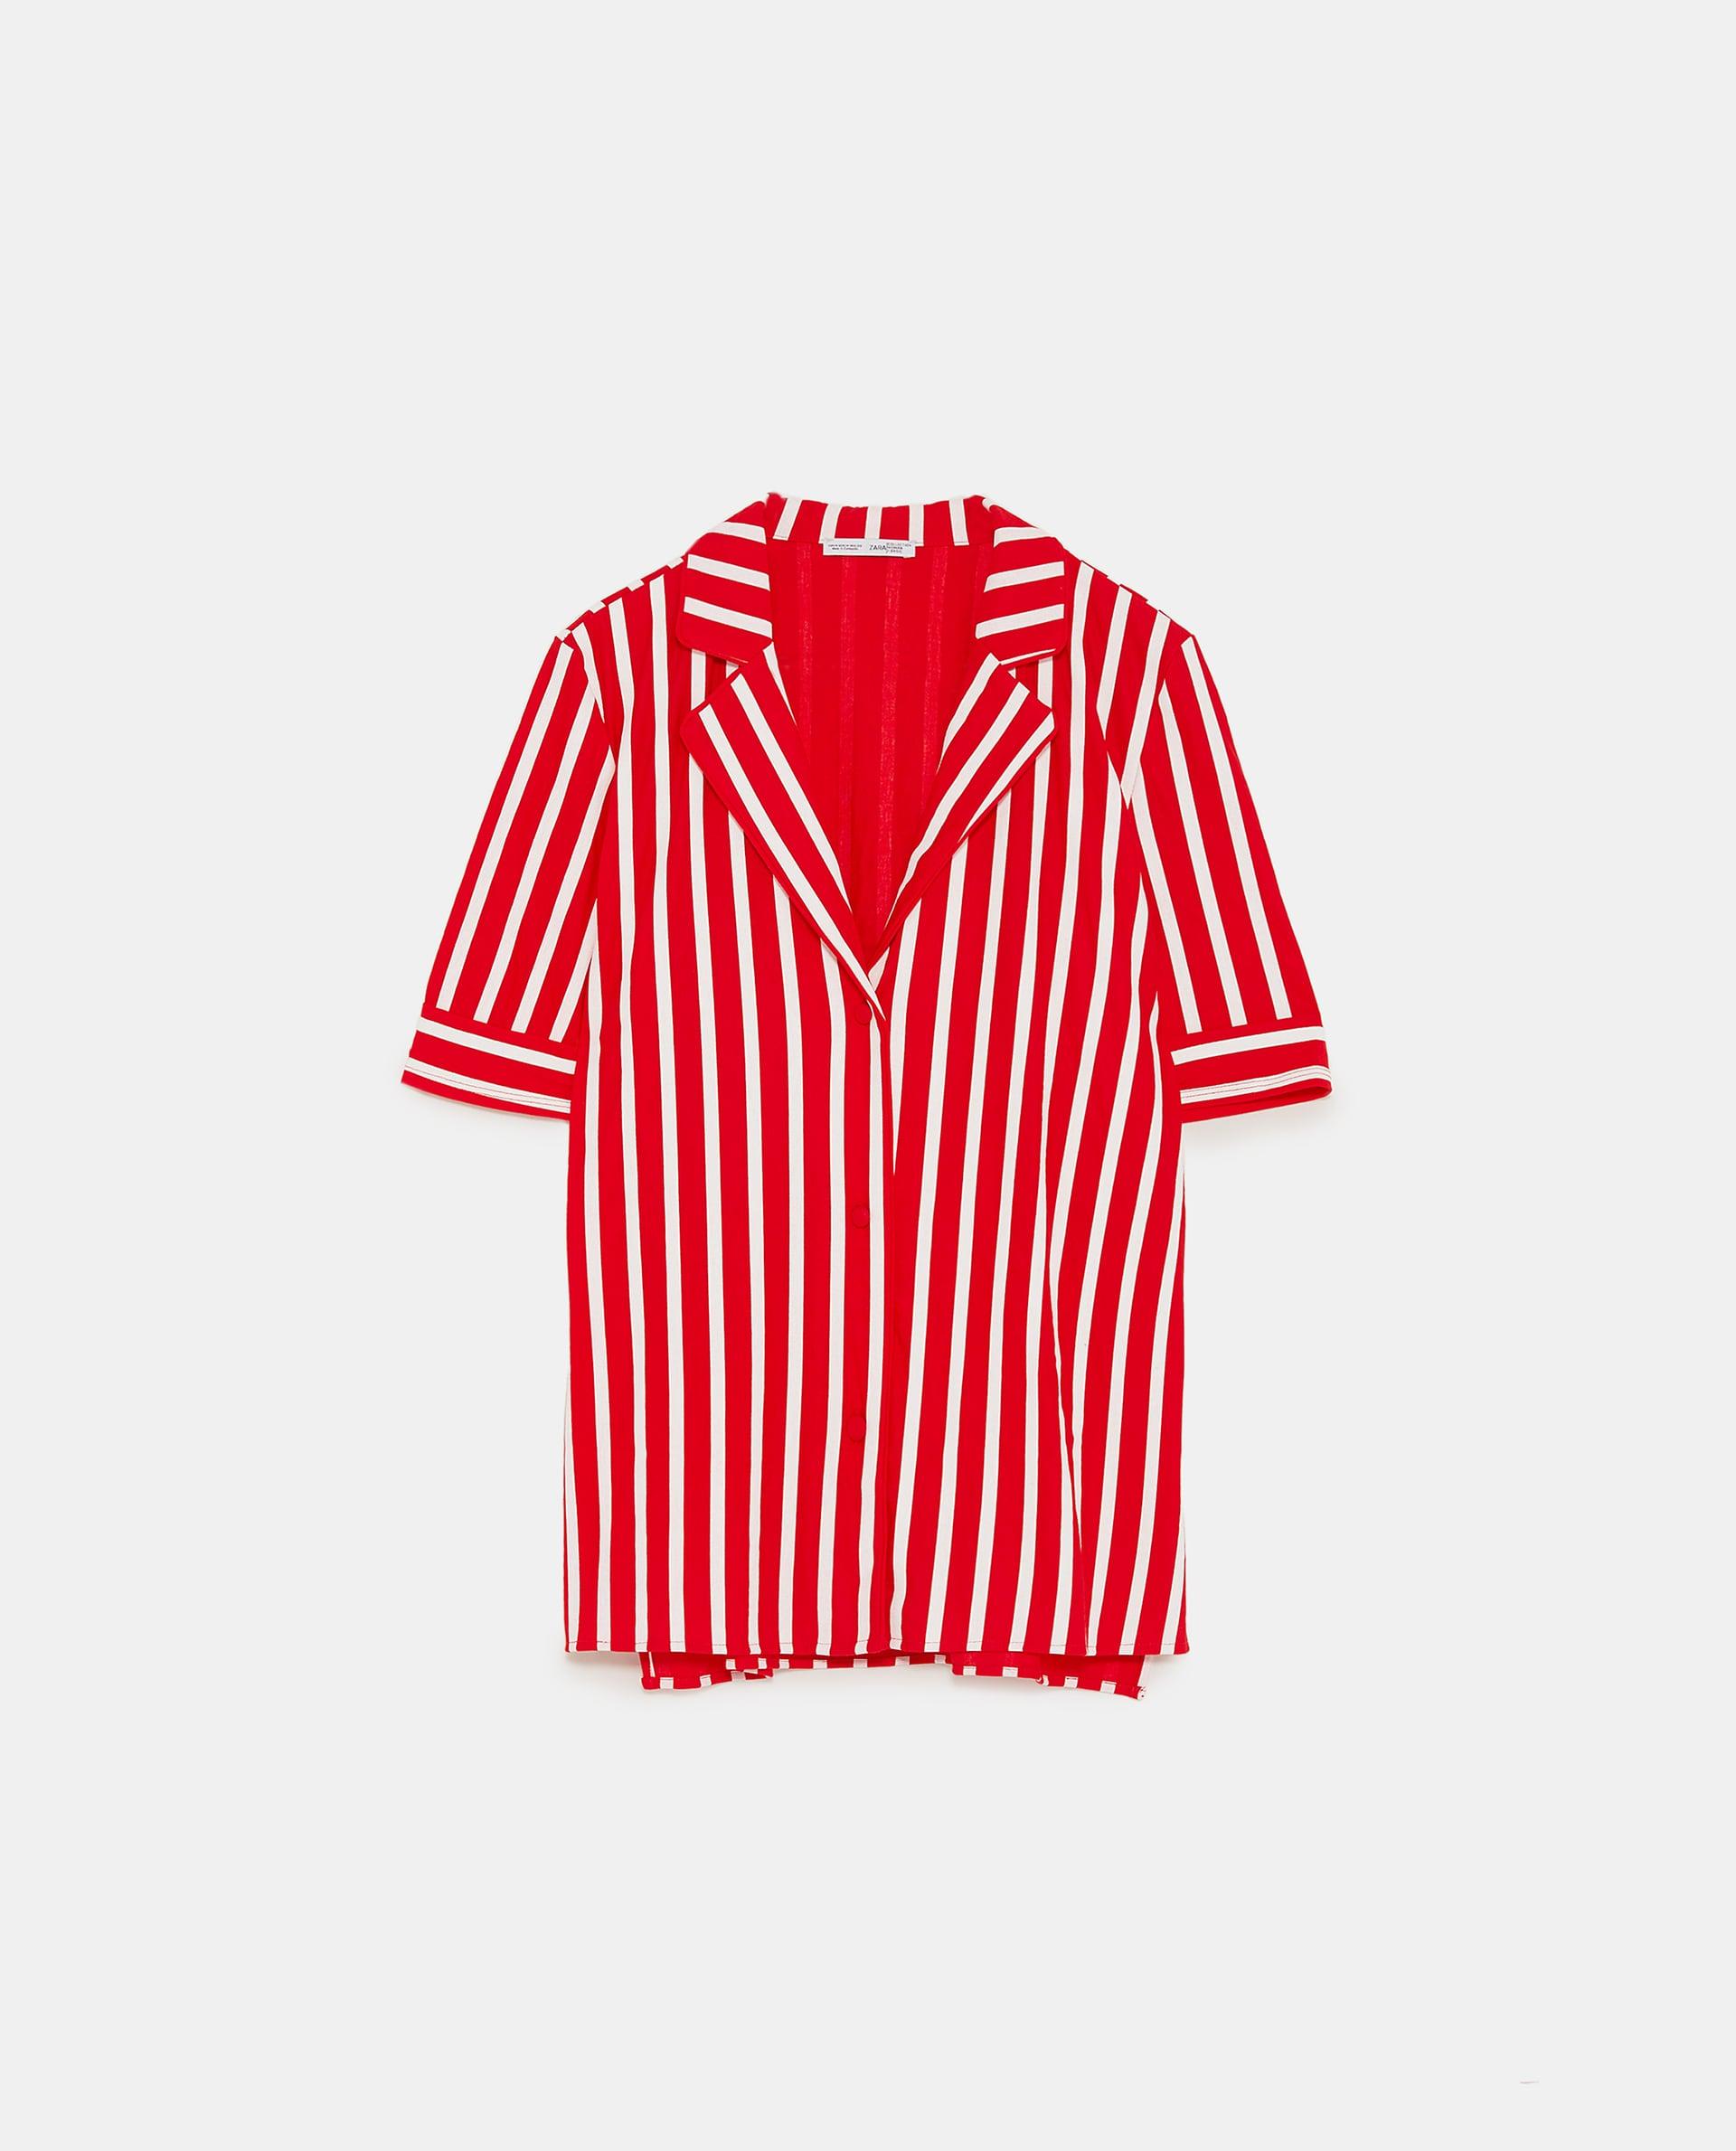 https://www.zara.com/ca/en/striped-shirt-p05580159.html?v1=5981001&v2=719021